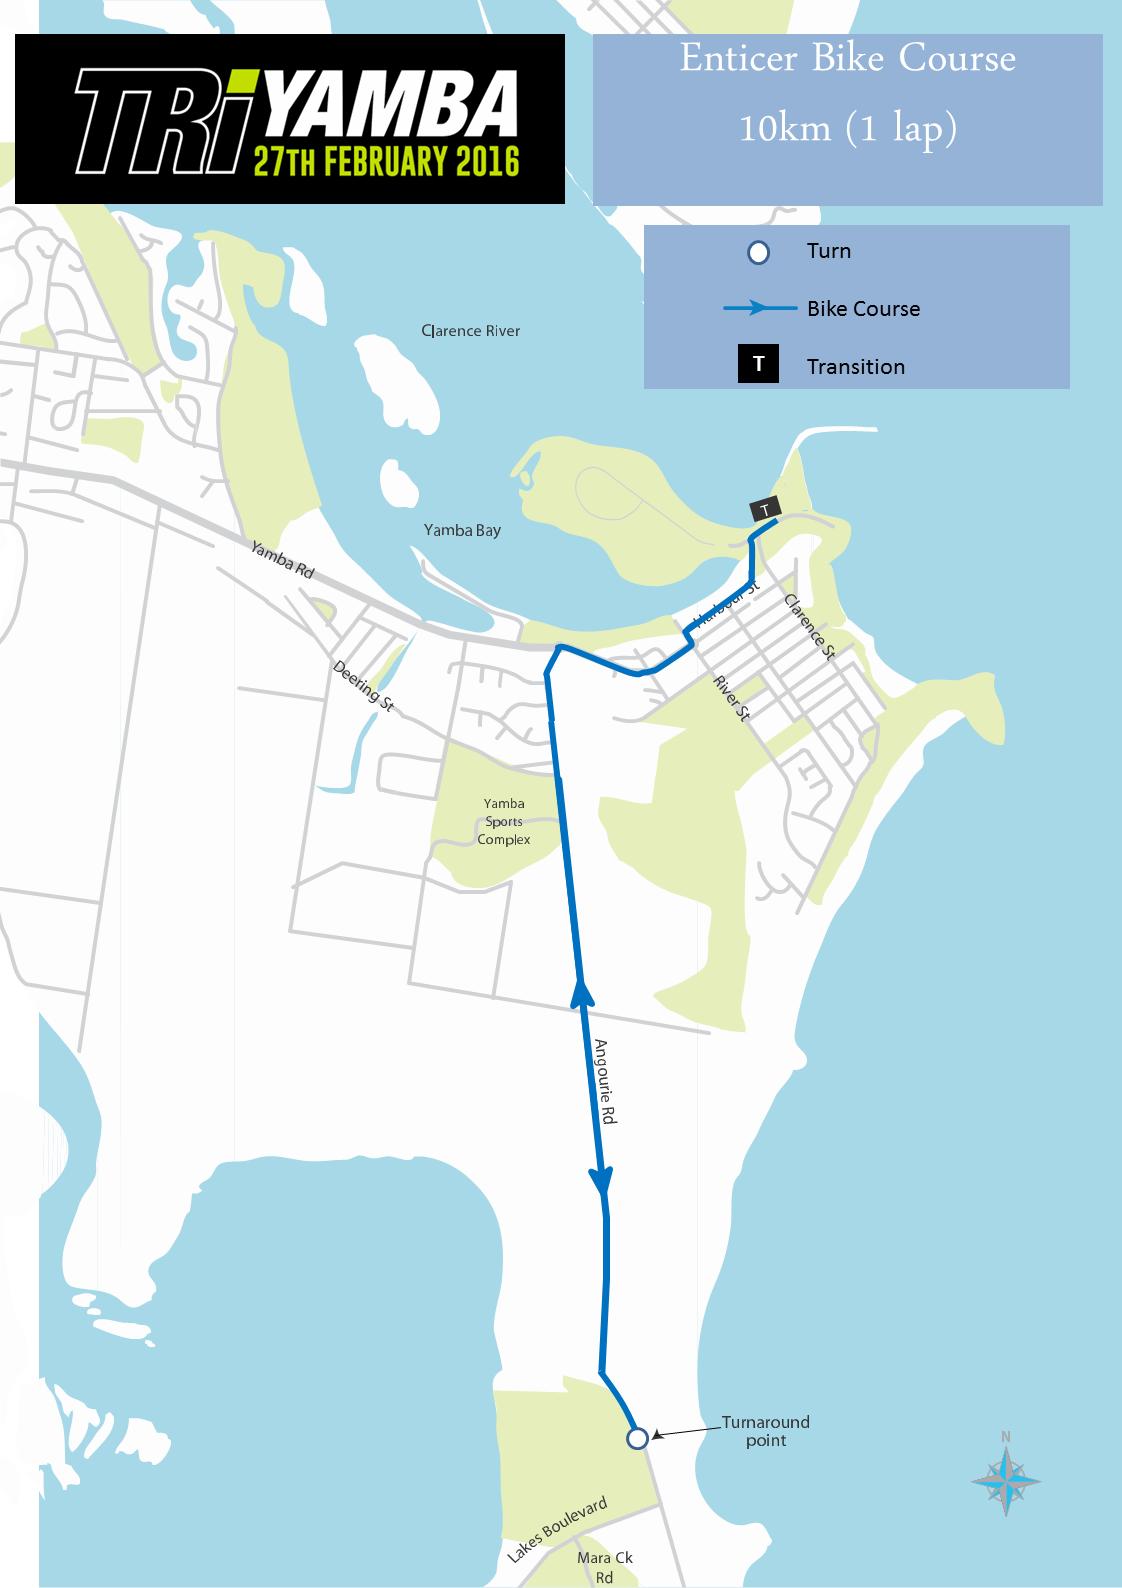 http://www.eliteenergy.com.au/wp-content/uploads/2015/06/Enticer-Bike-Course-Map-2016.png